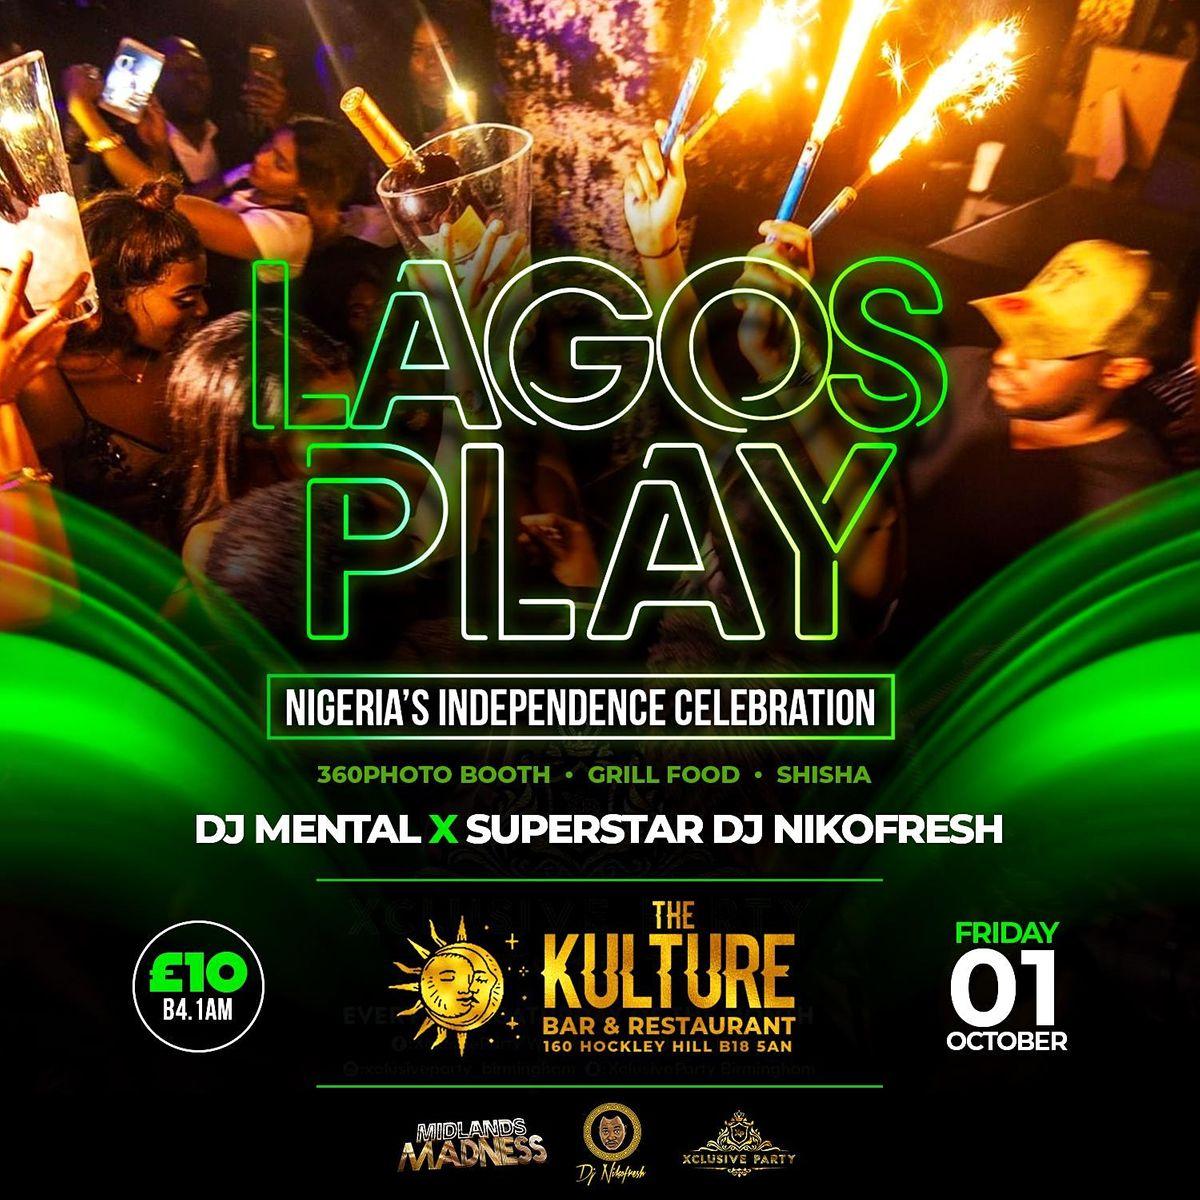 Lagos Play. Nigeria's Independence Bham